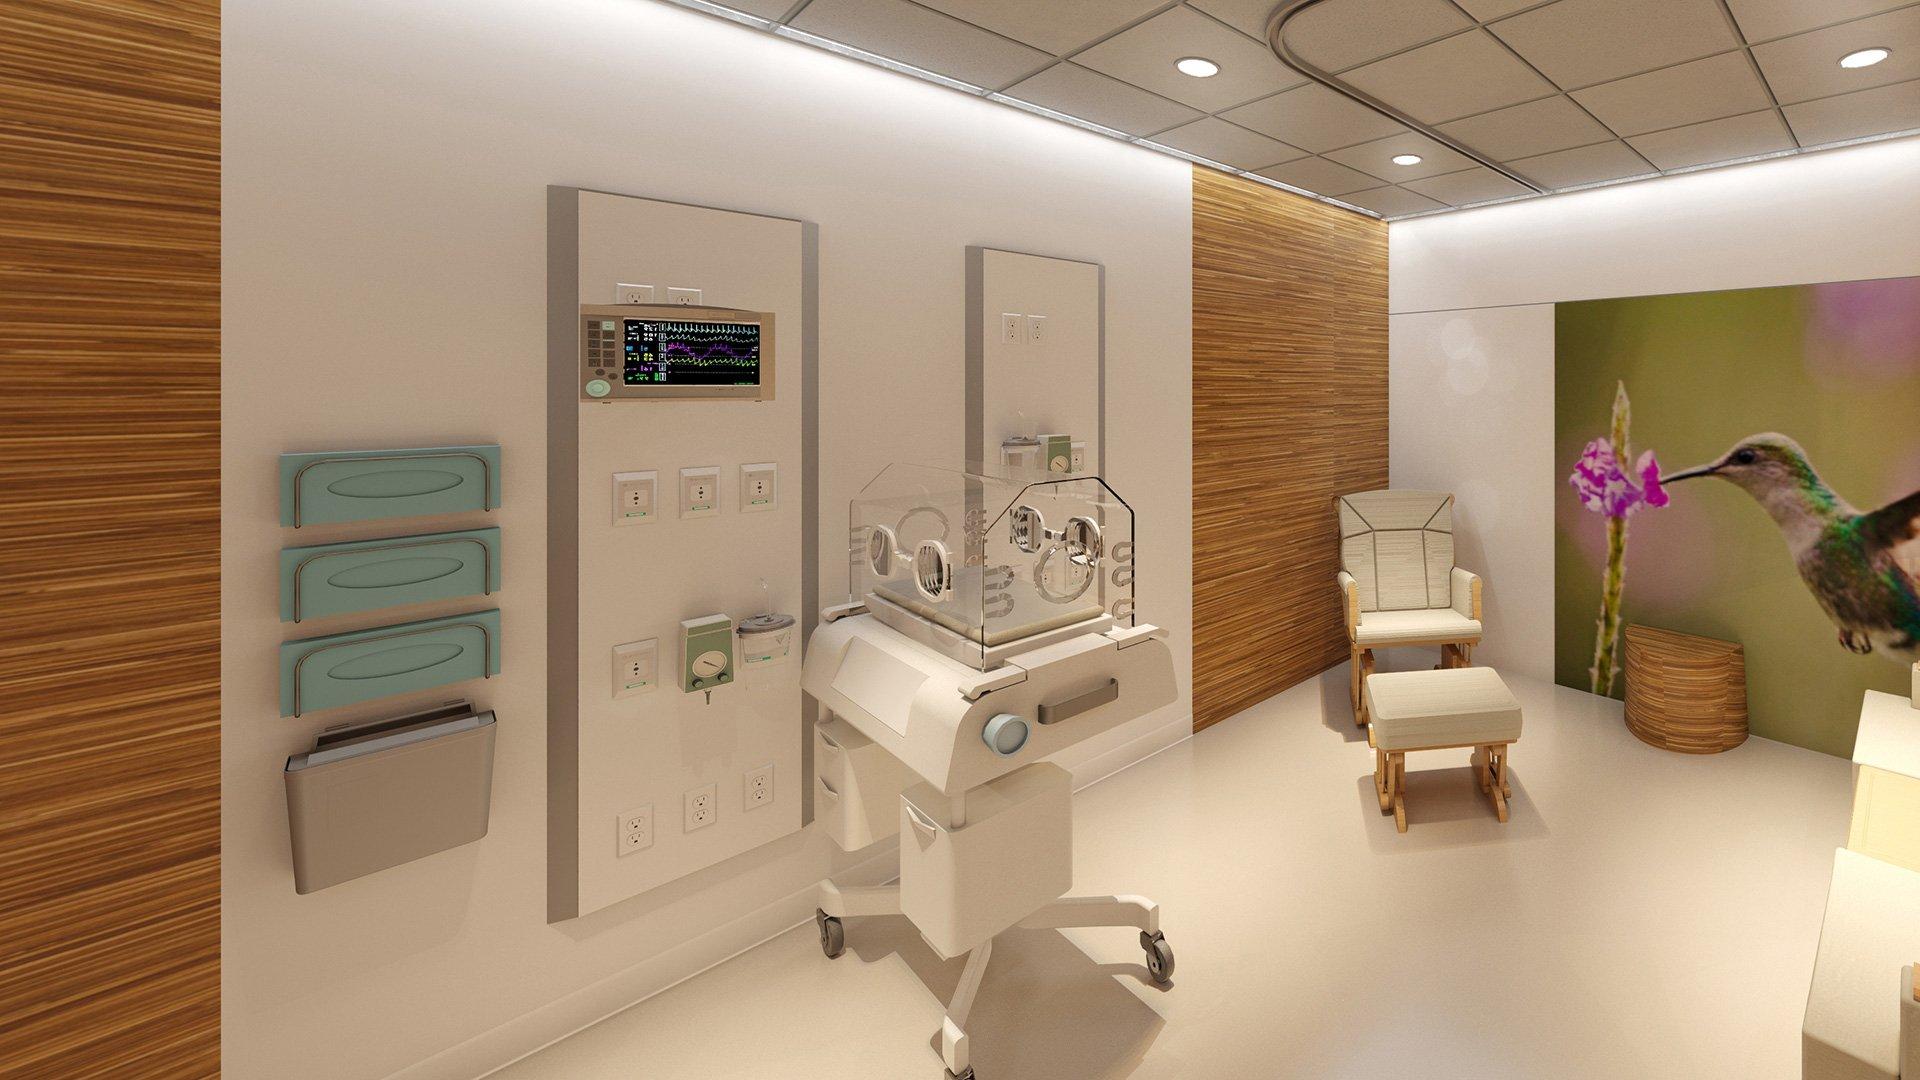 Bon Secours St. Francis Eastside Neonatal Care Unit, Rendering